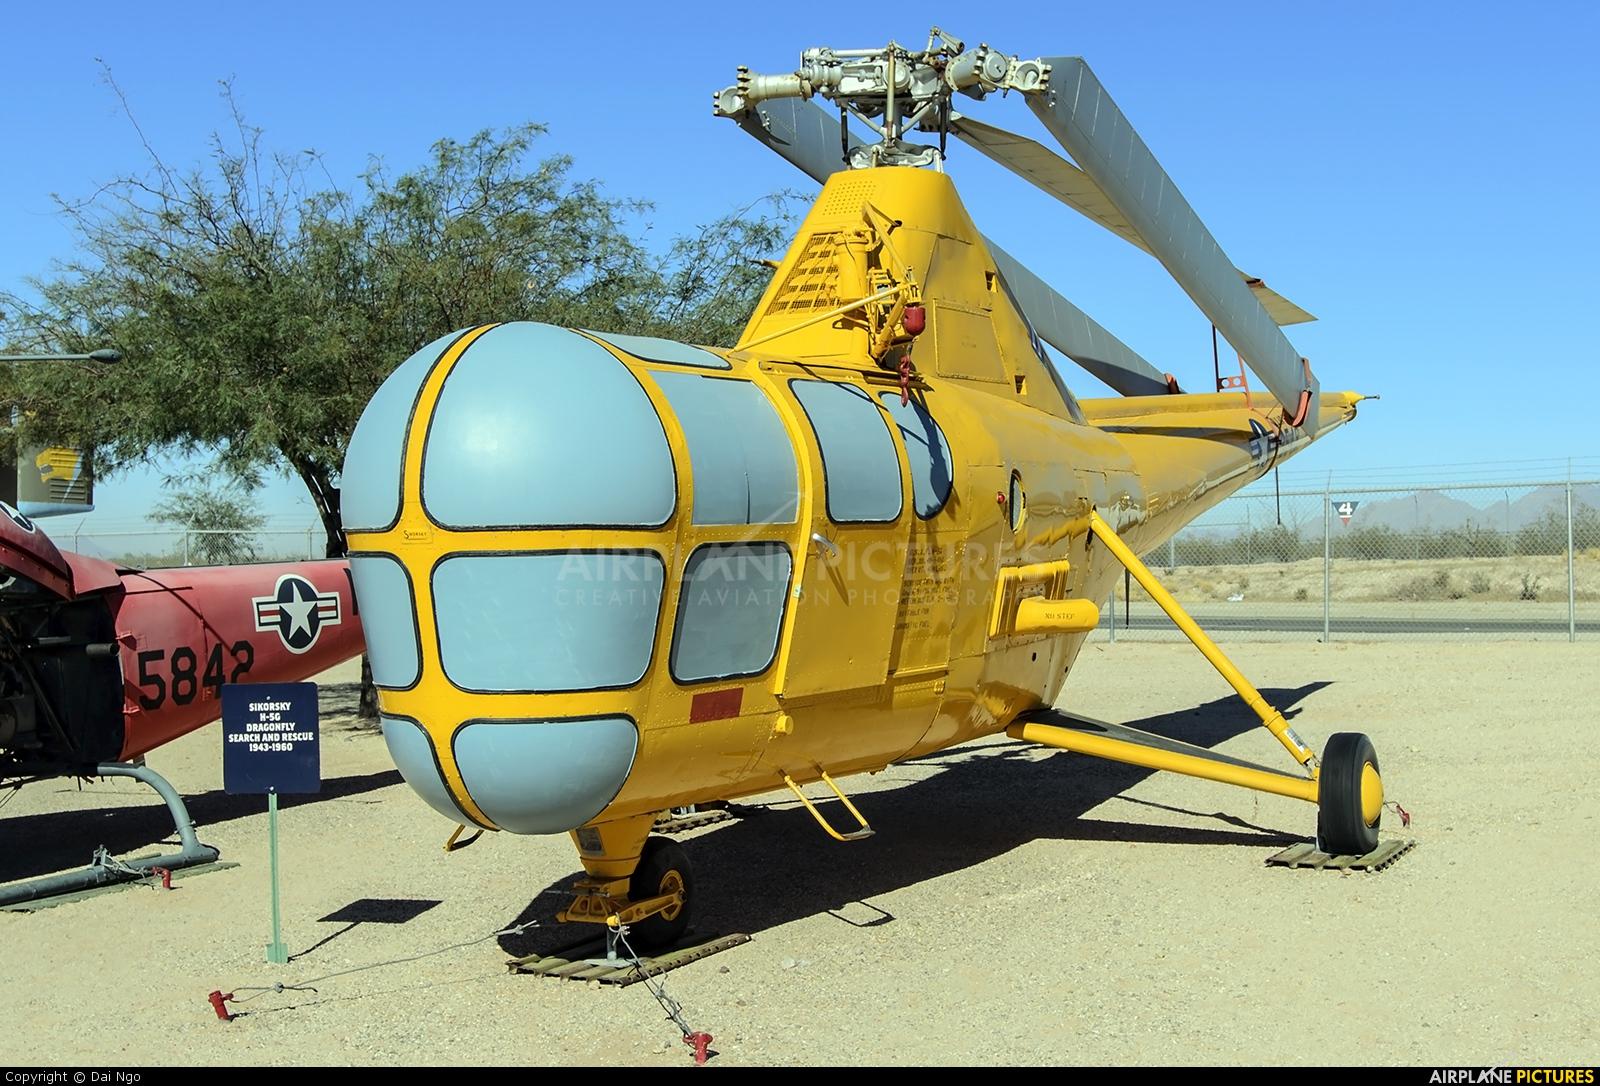 USA - Air Force 48-0548 aircraft at Tucson - Pima Air & Space Museum